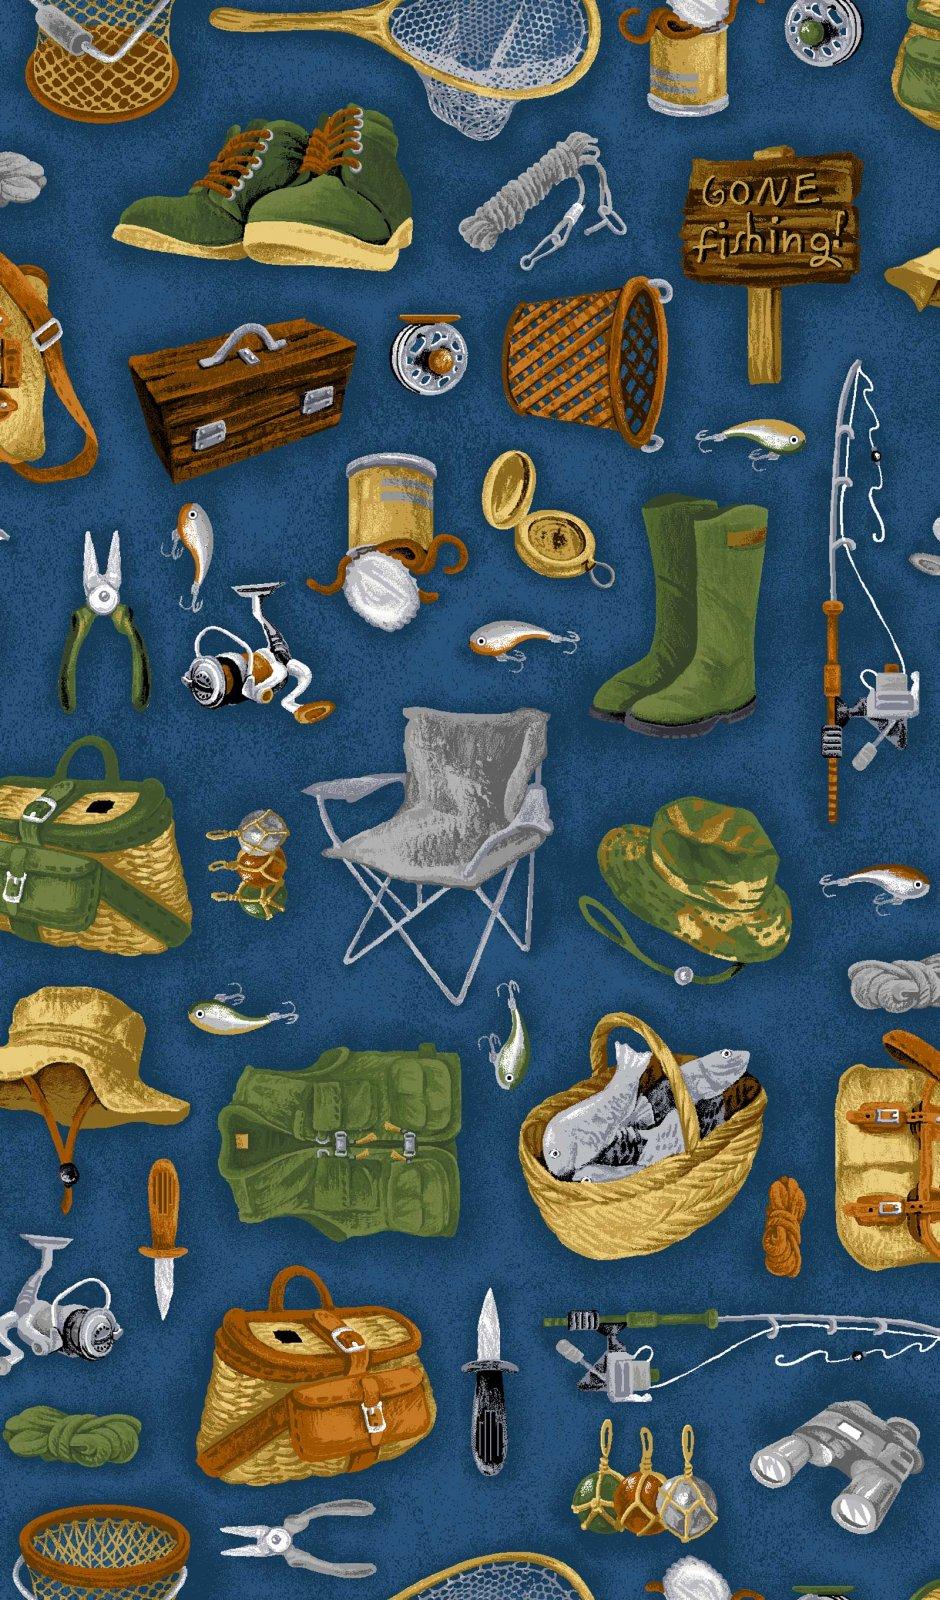 Go Fish - Equipment Blue - 6019202